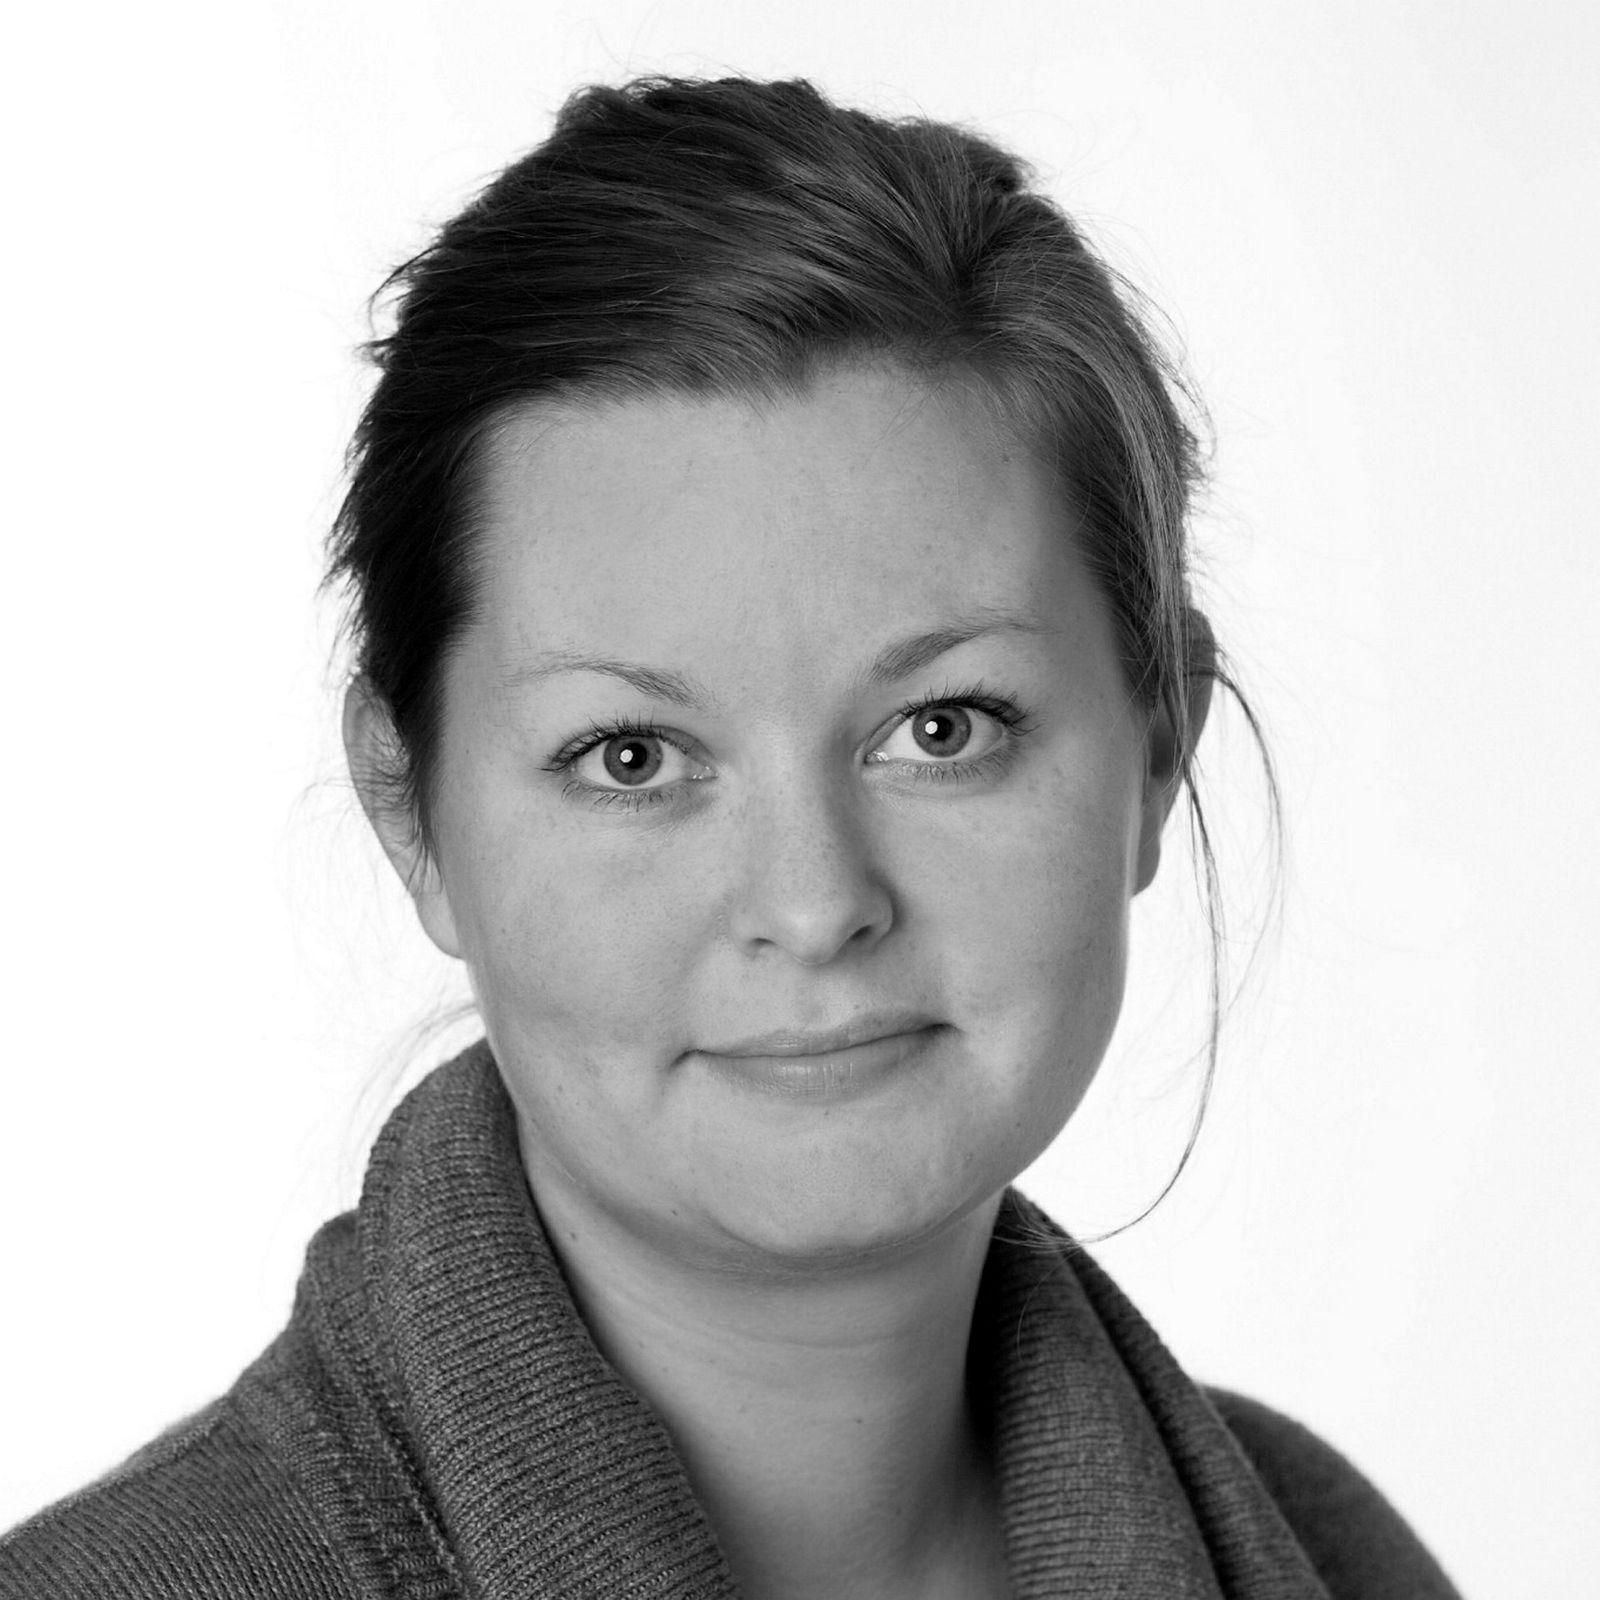 Marianne Barland